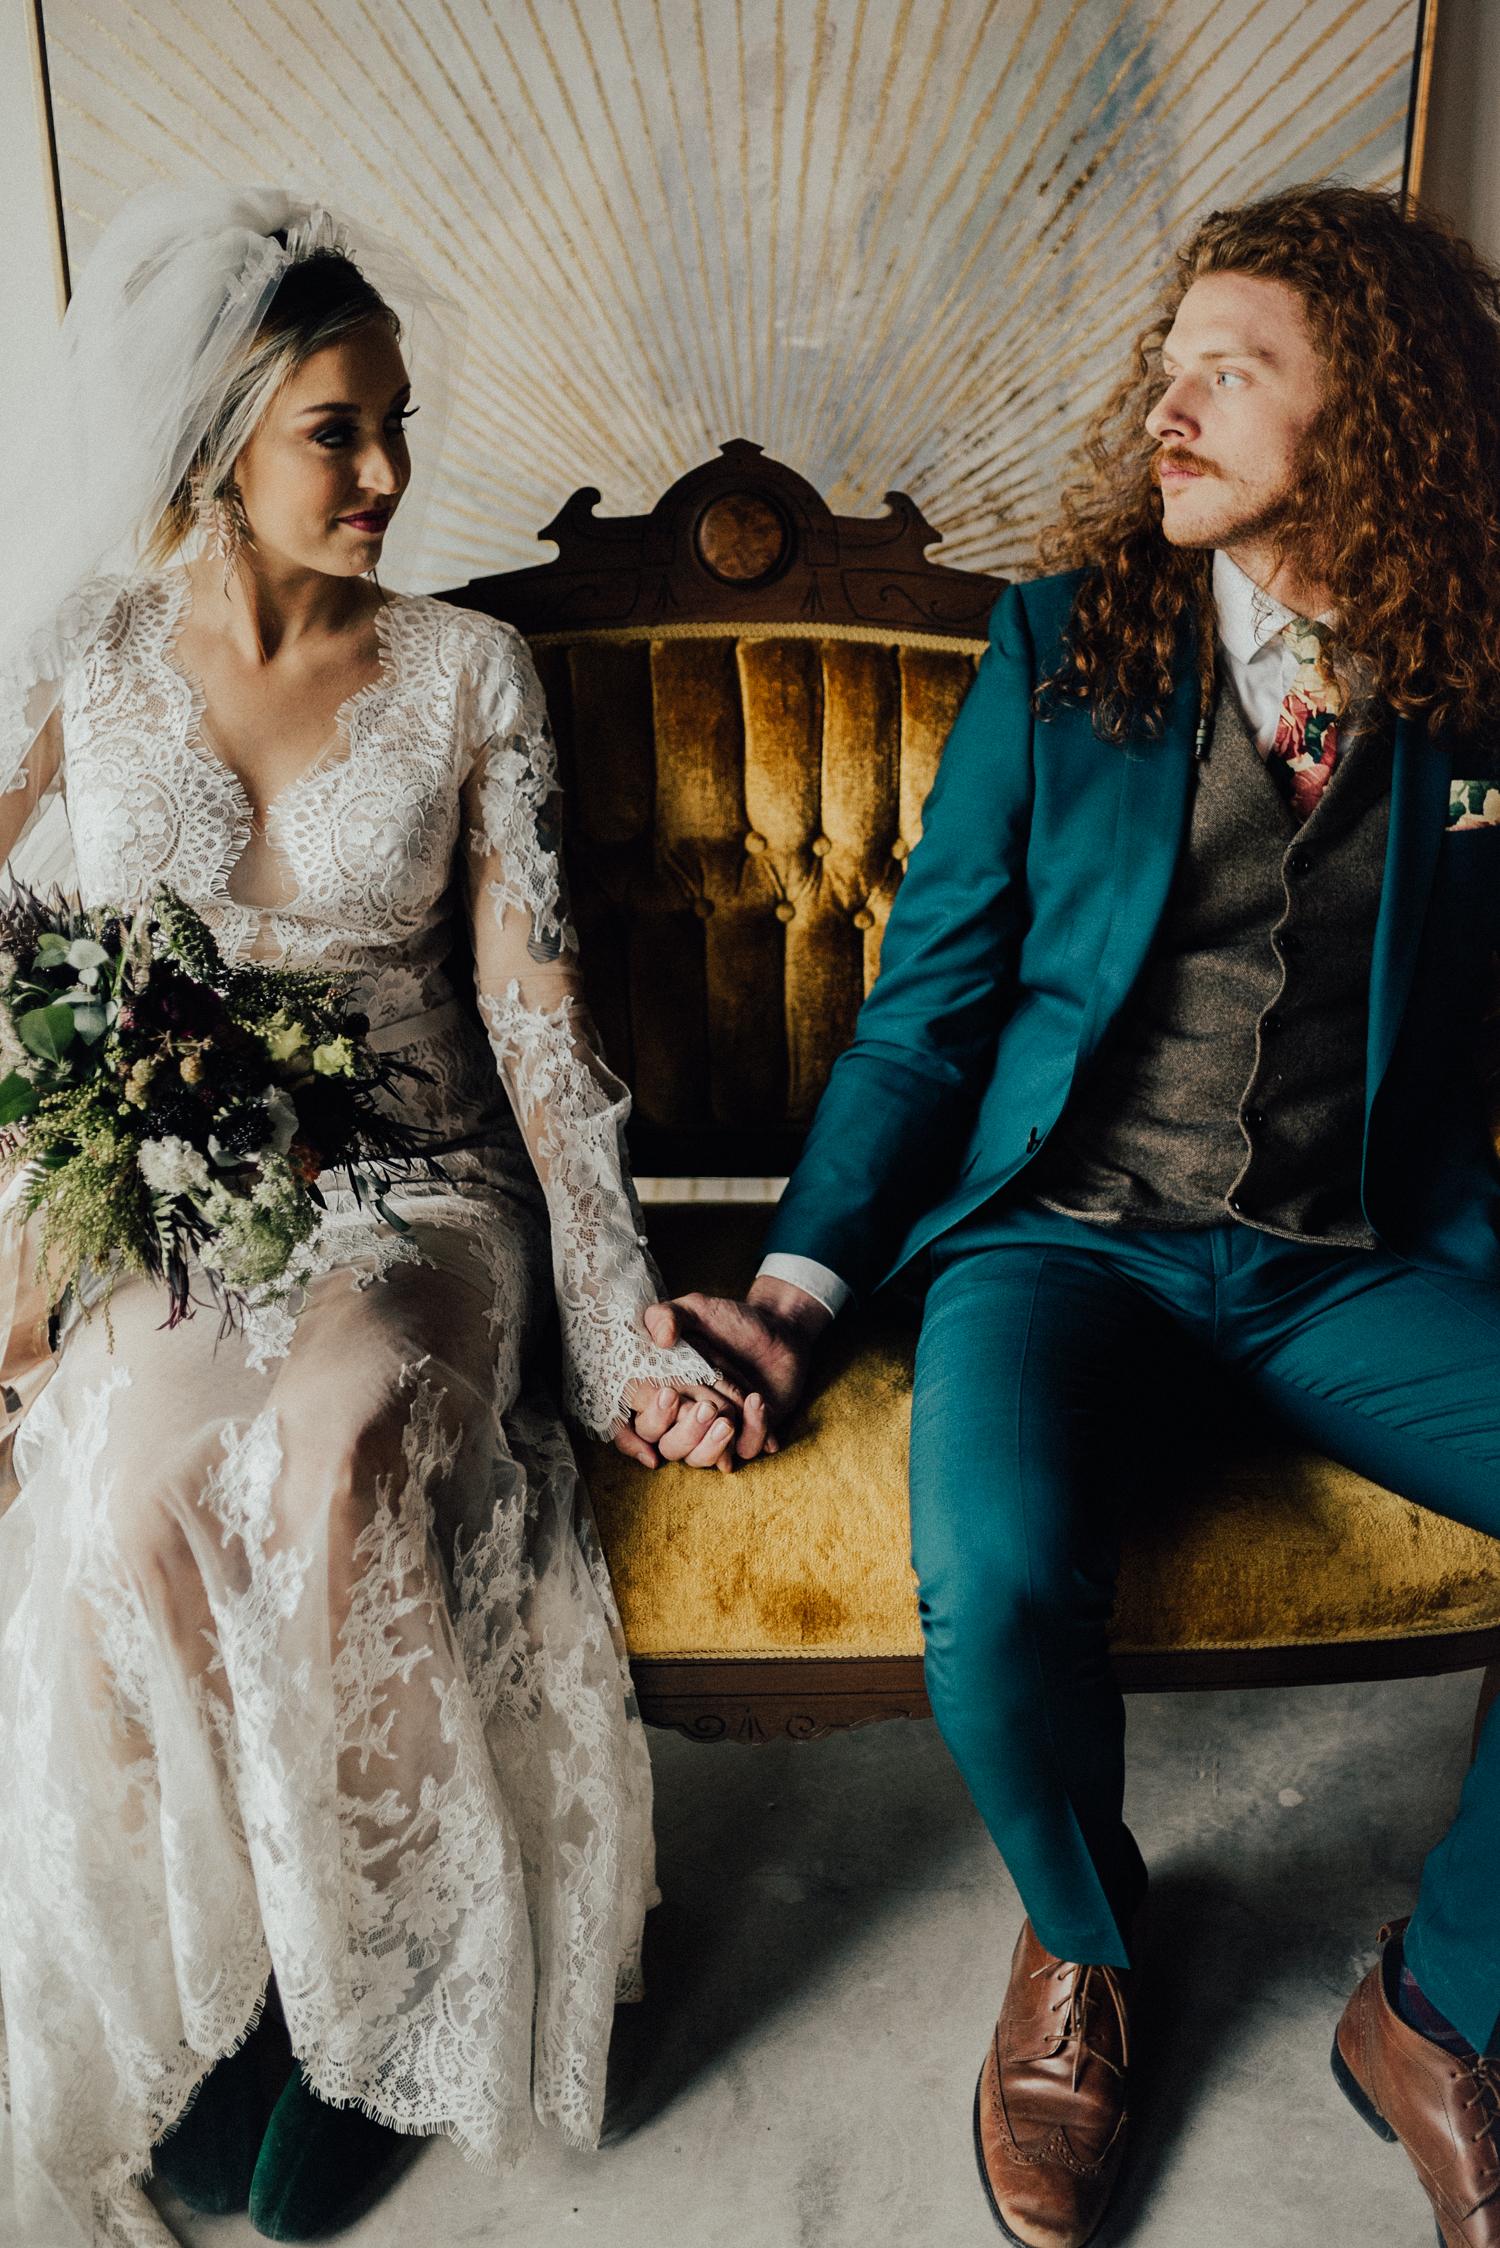 St-Louis-wedding-photographers-94.jpg